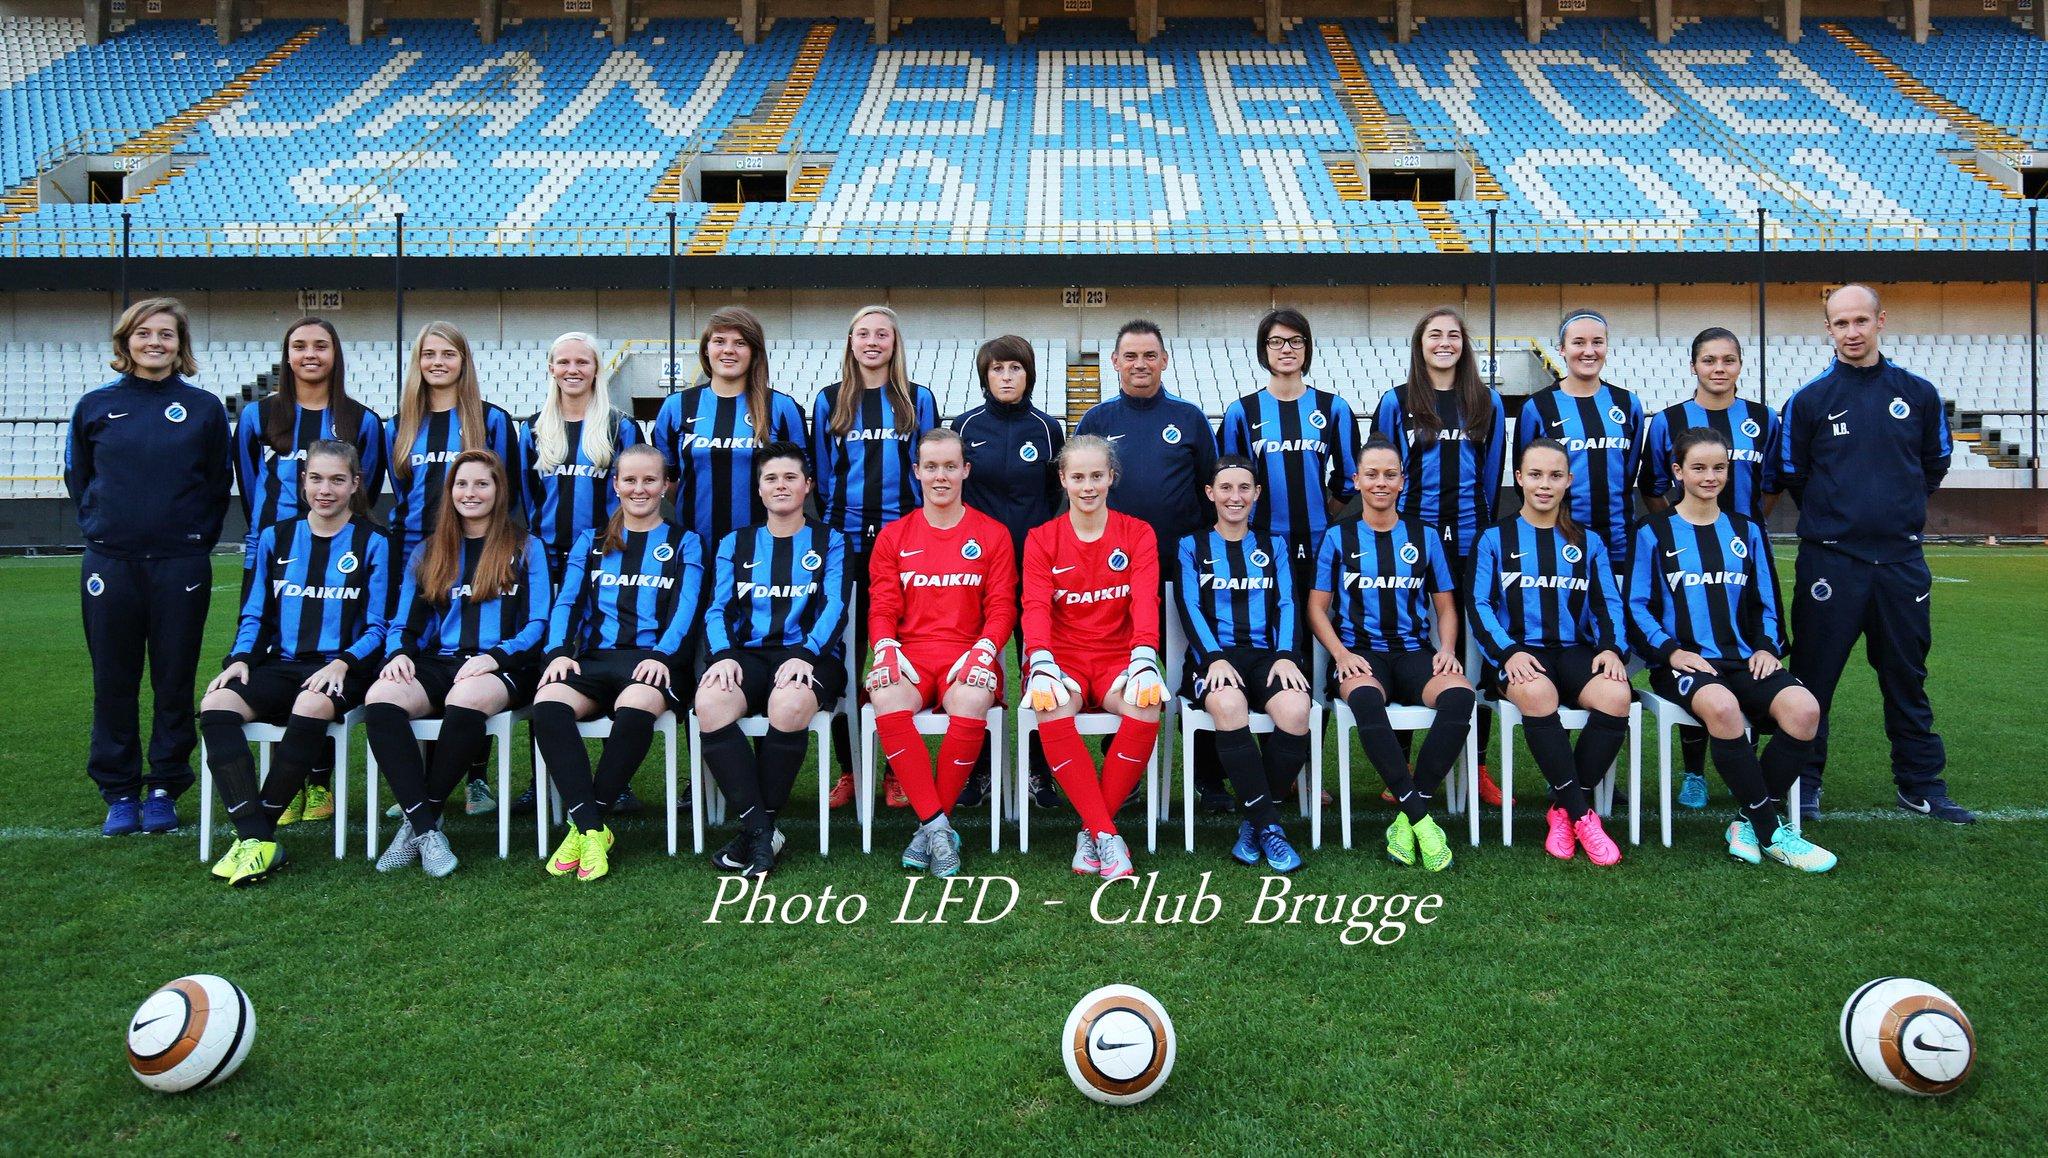 Dames Club Brugge - Stamnummer 3